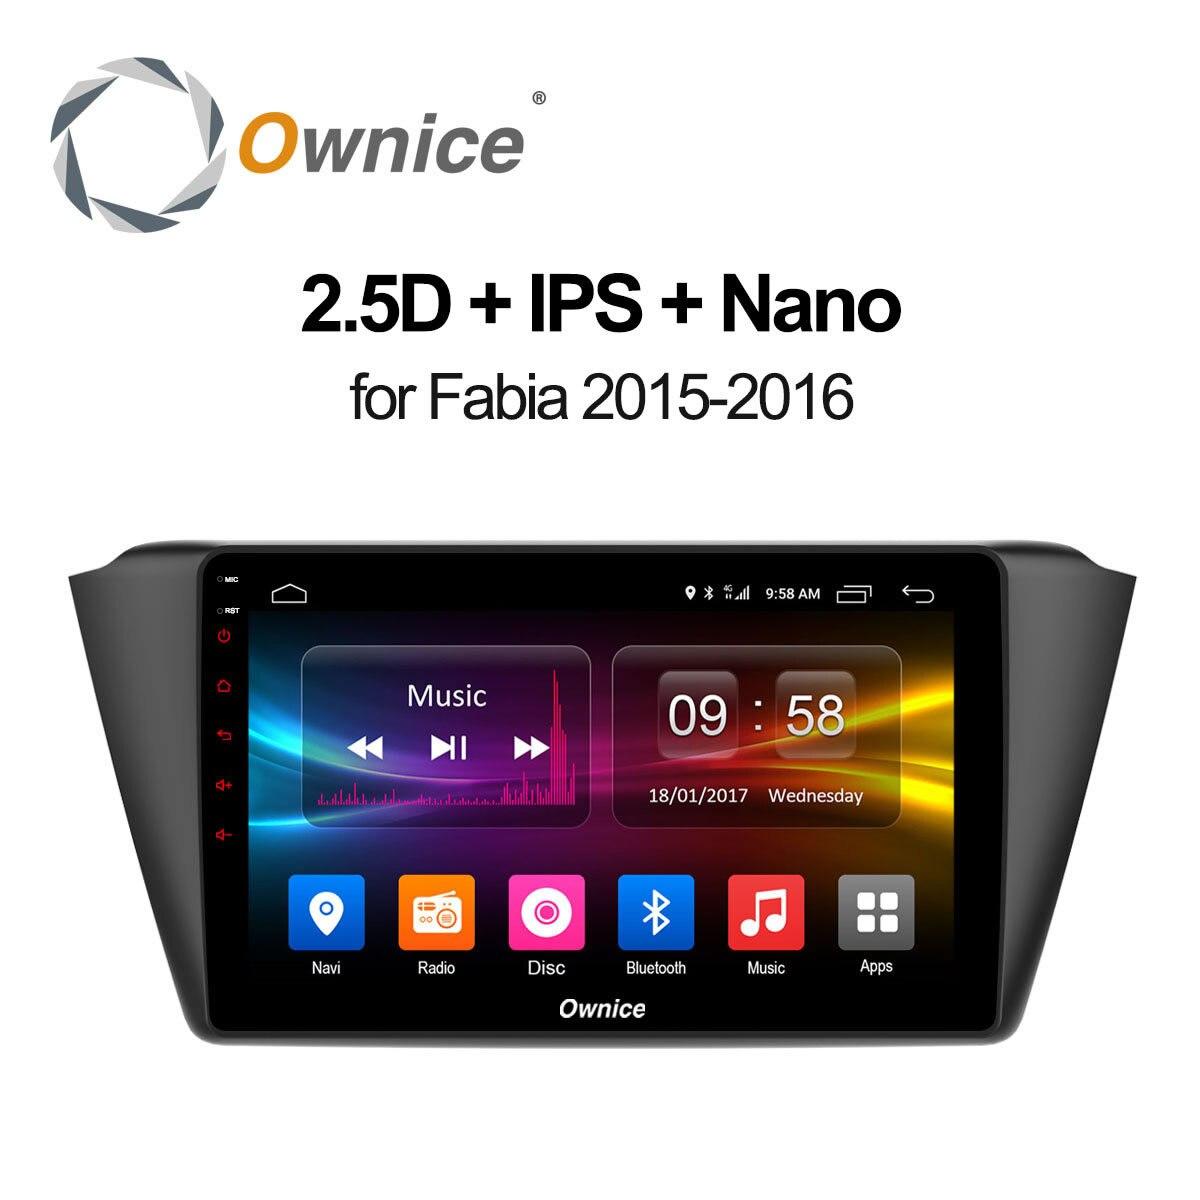 Ownice C500+ Octa 8 Core Andoid 6.0 Car radio player GPS navi 2G RAM 32GB ROM for Skoda Fabia 2015 2016 support 4G SIM Card DVR